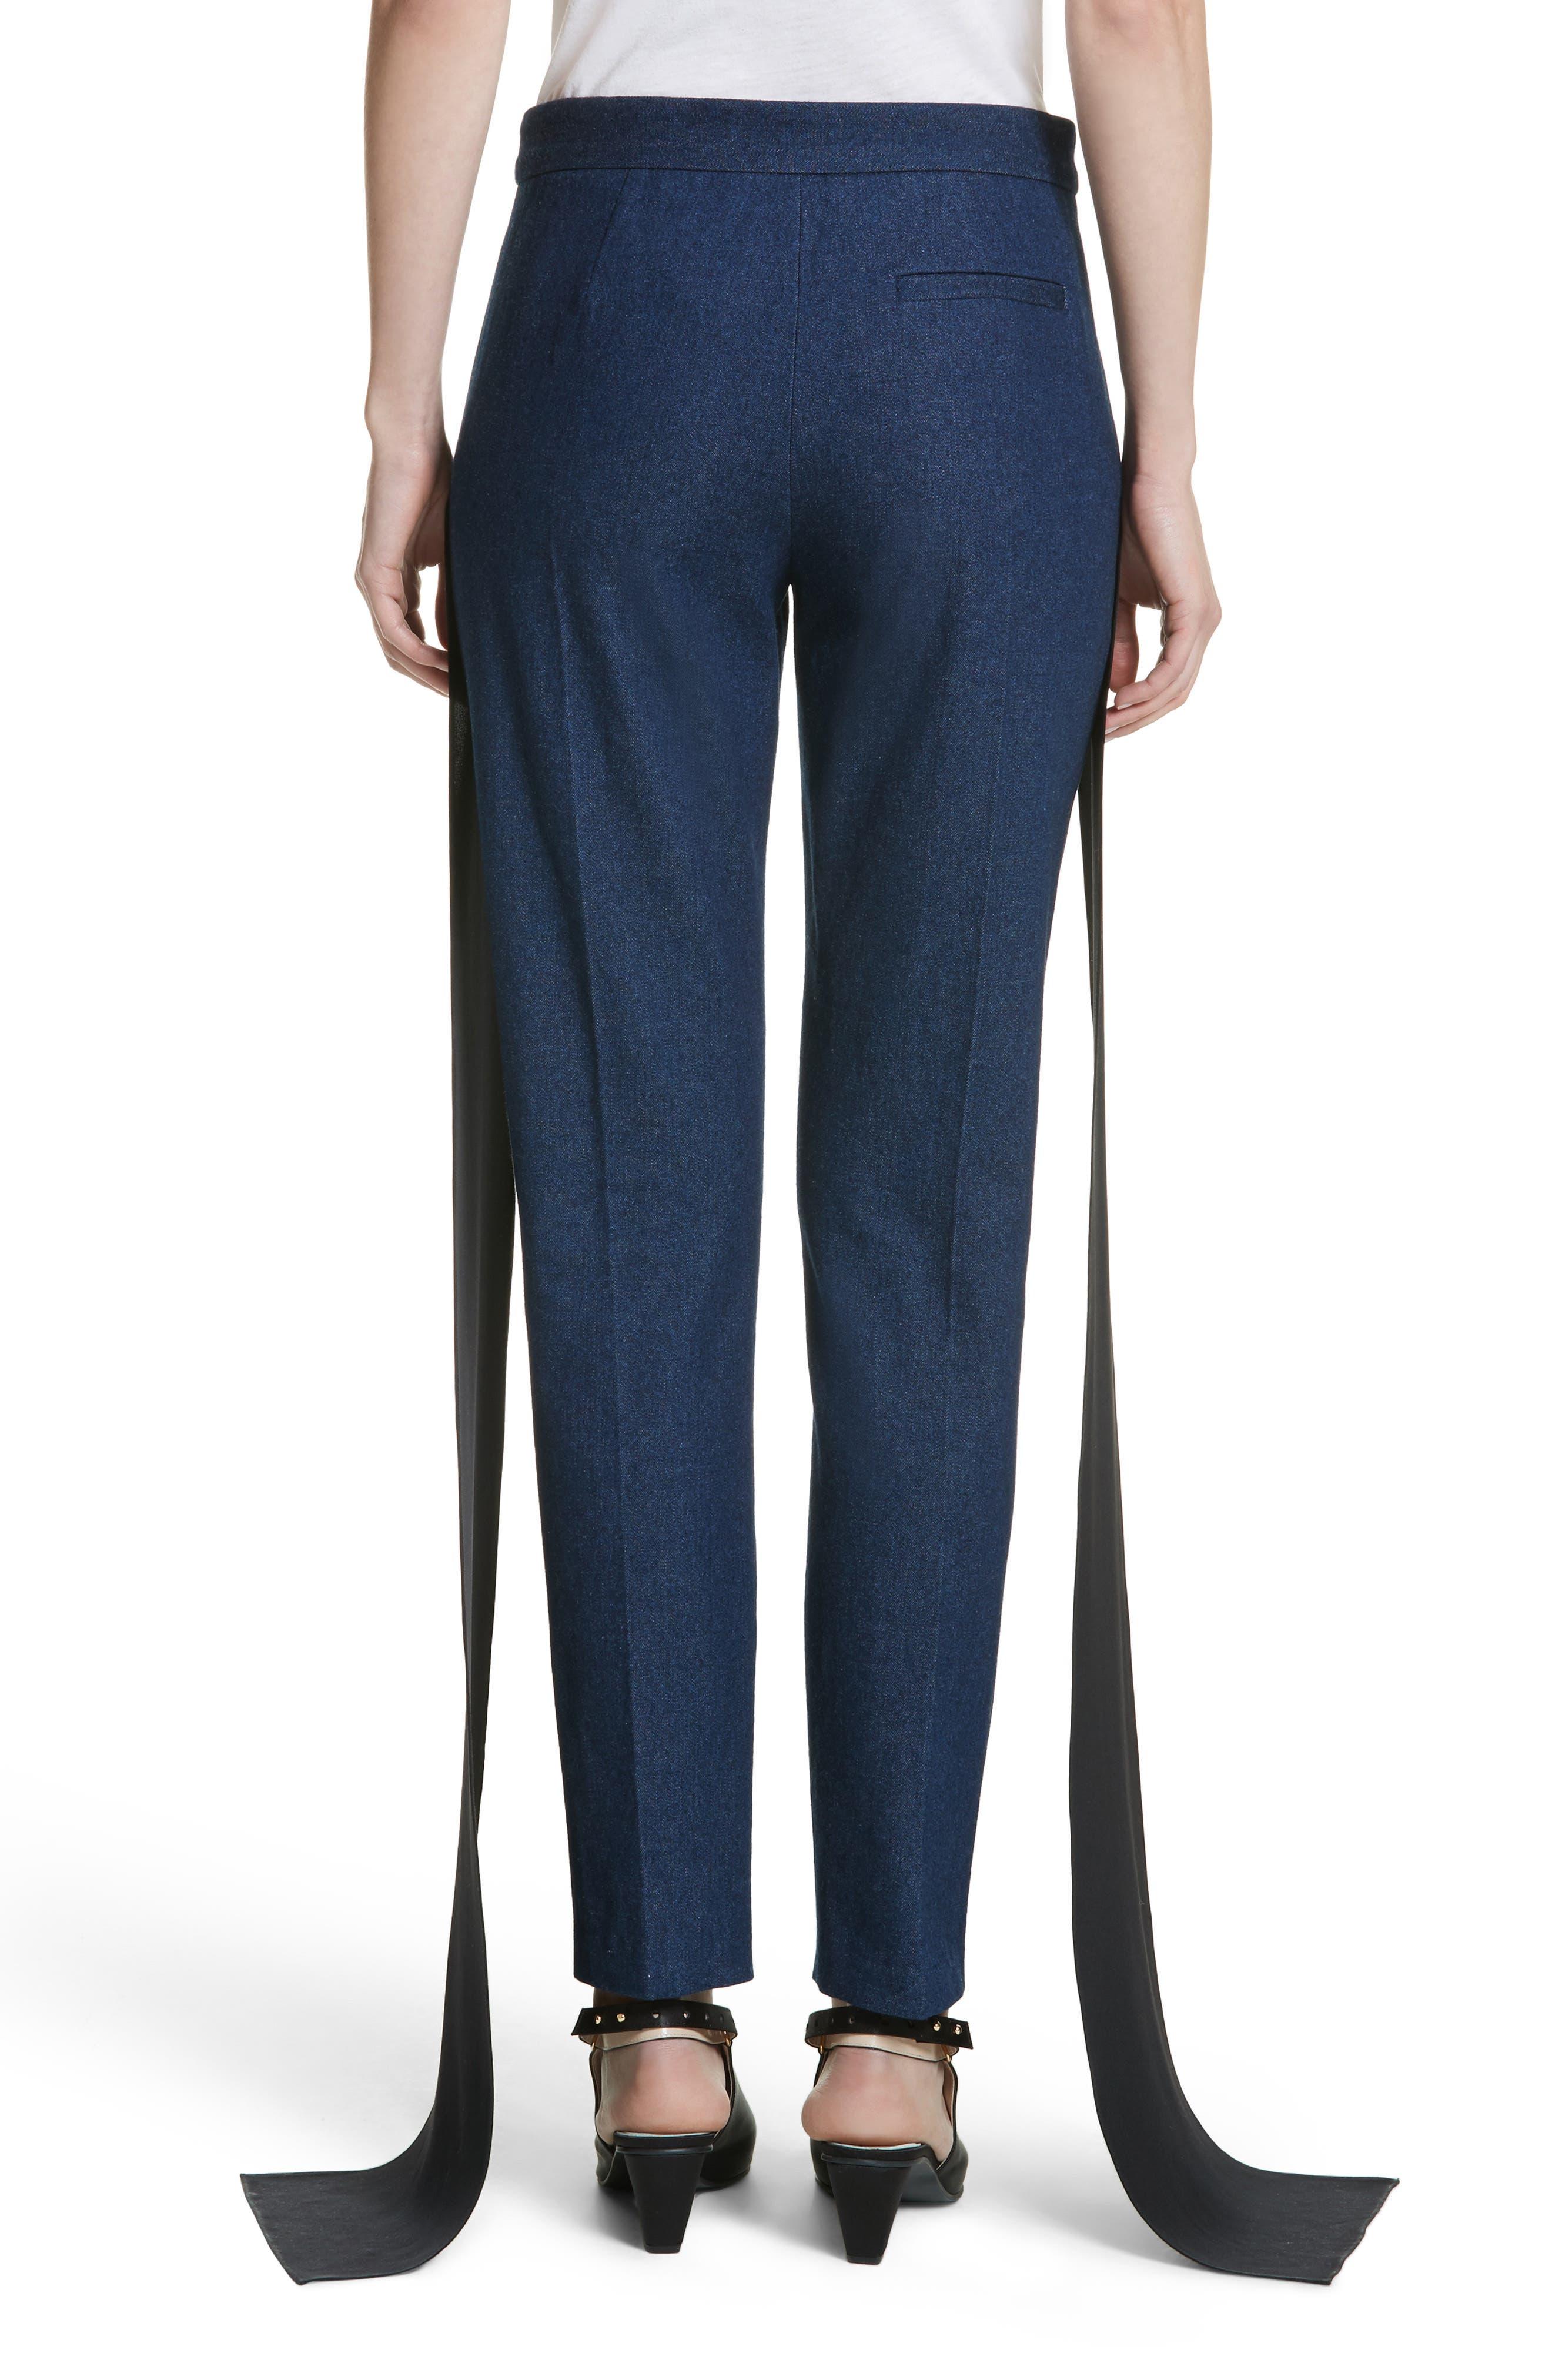 Mojave Side Panel Skinny Jeans,                             Alternate thumbnail 3, color,                             Dark Wash Denim